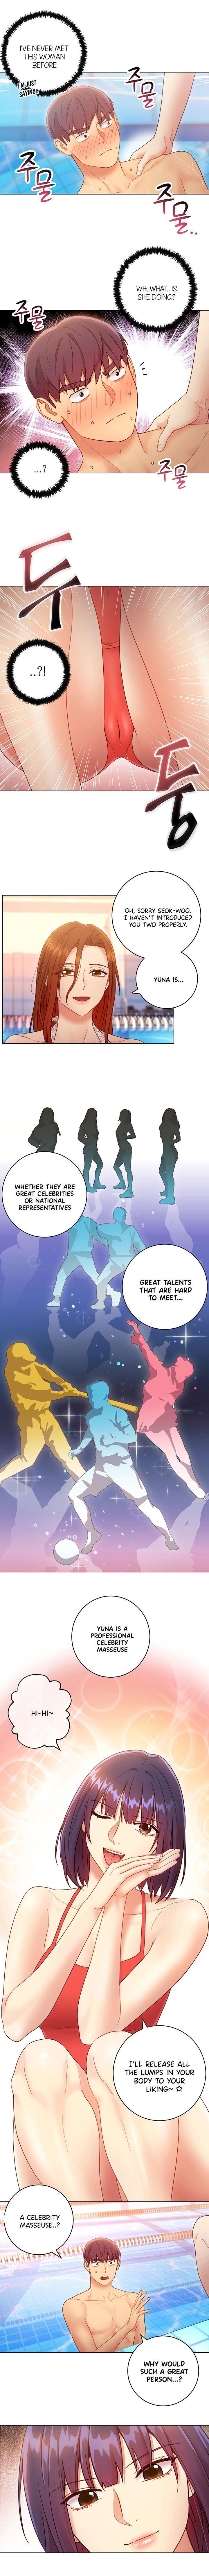 [Neck Pilllow] Stepmother Friends Ch.39/? [English] [Hentai Universe] NEW! 13/10/2020 323